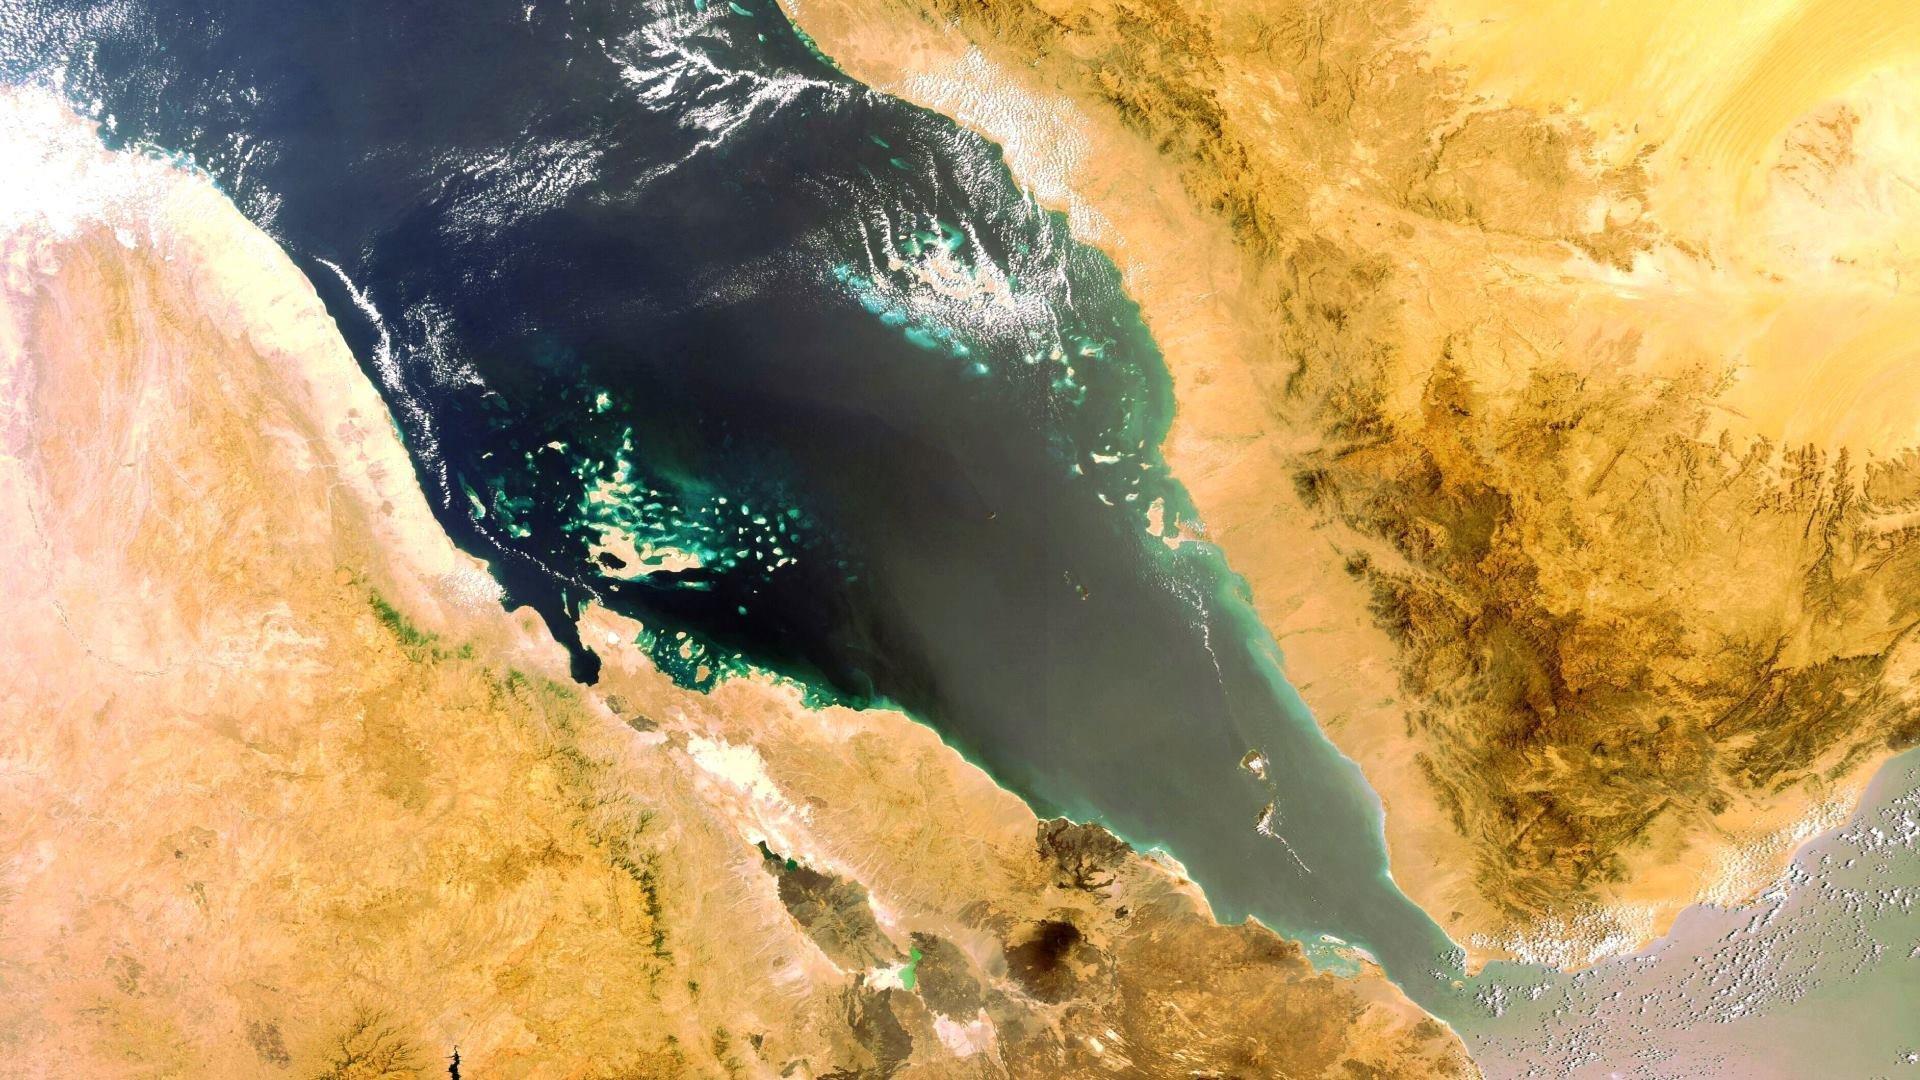 Красное море оказалось зрелым океаном